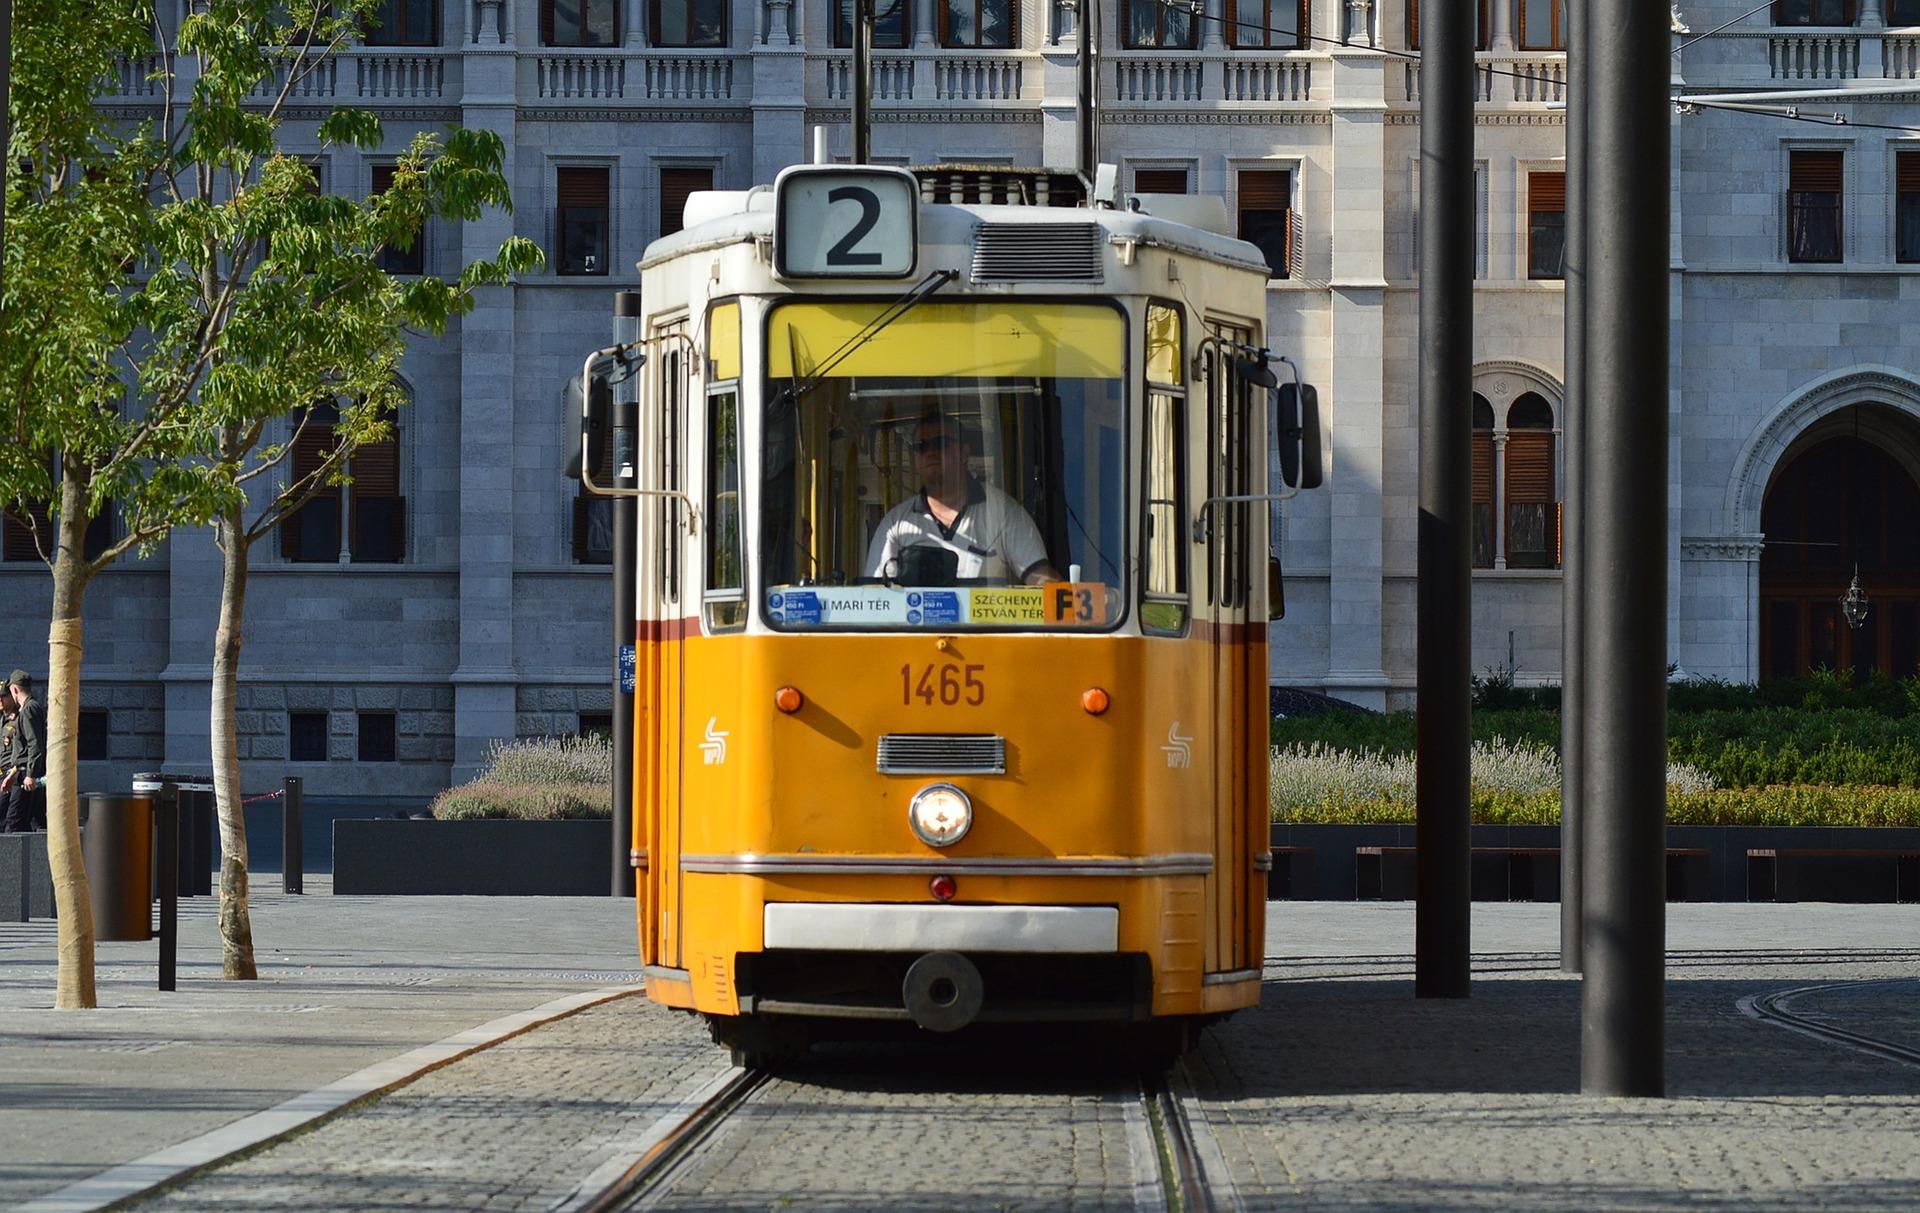 budapest-854618_1920